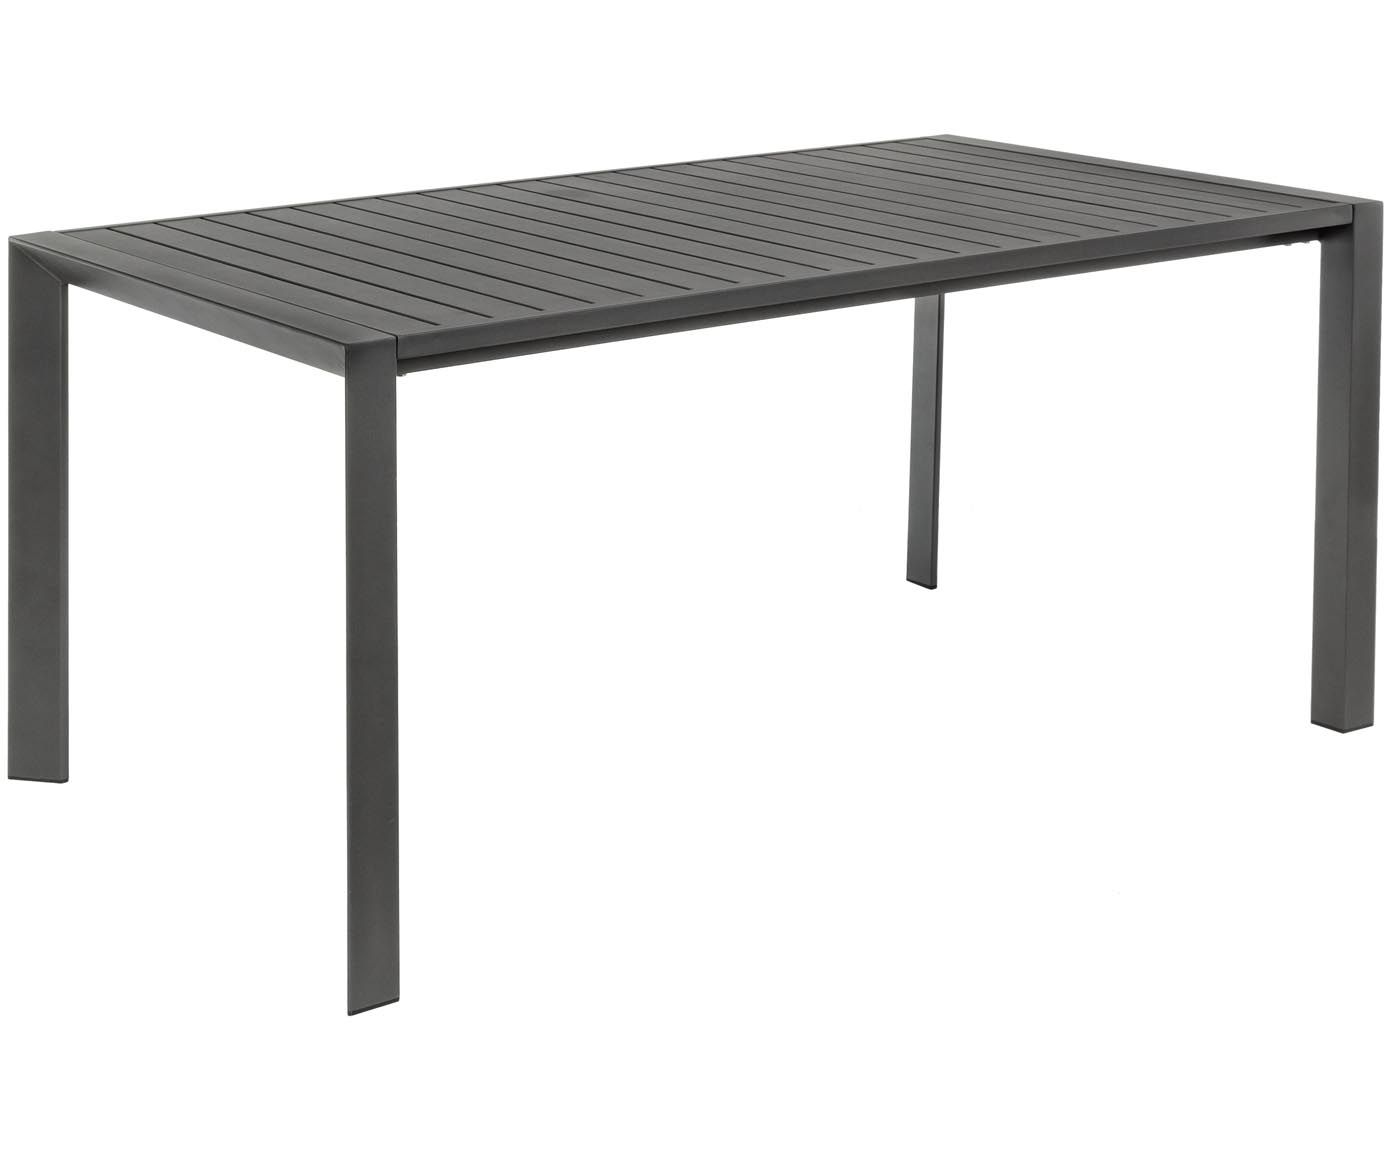 Gartentisch Davin In 2019 Balcony Design Outdoor Tables